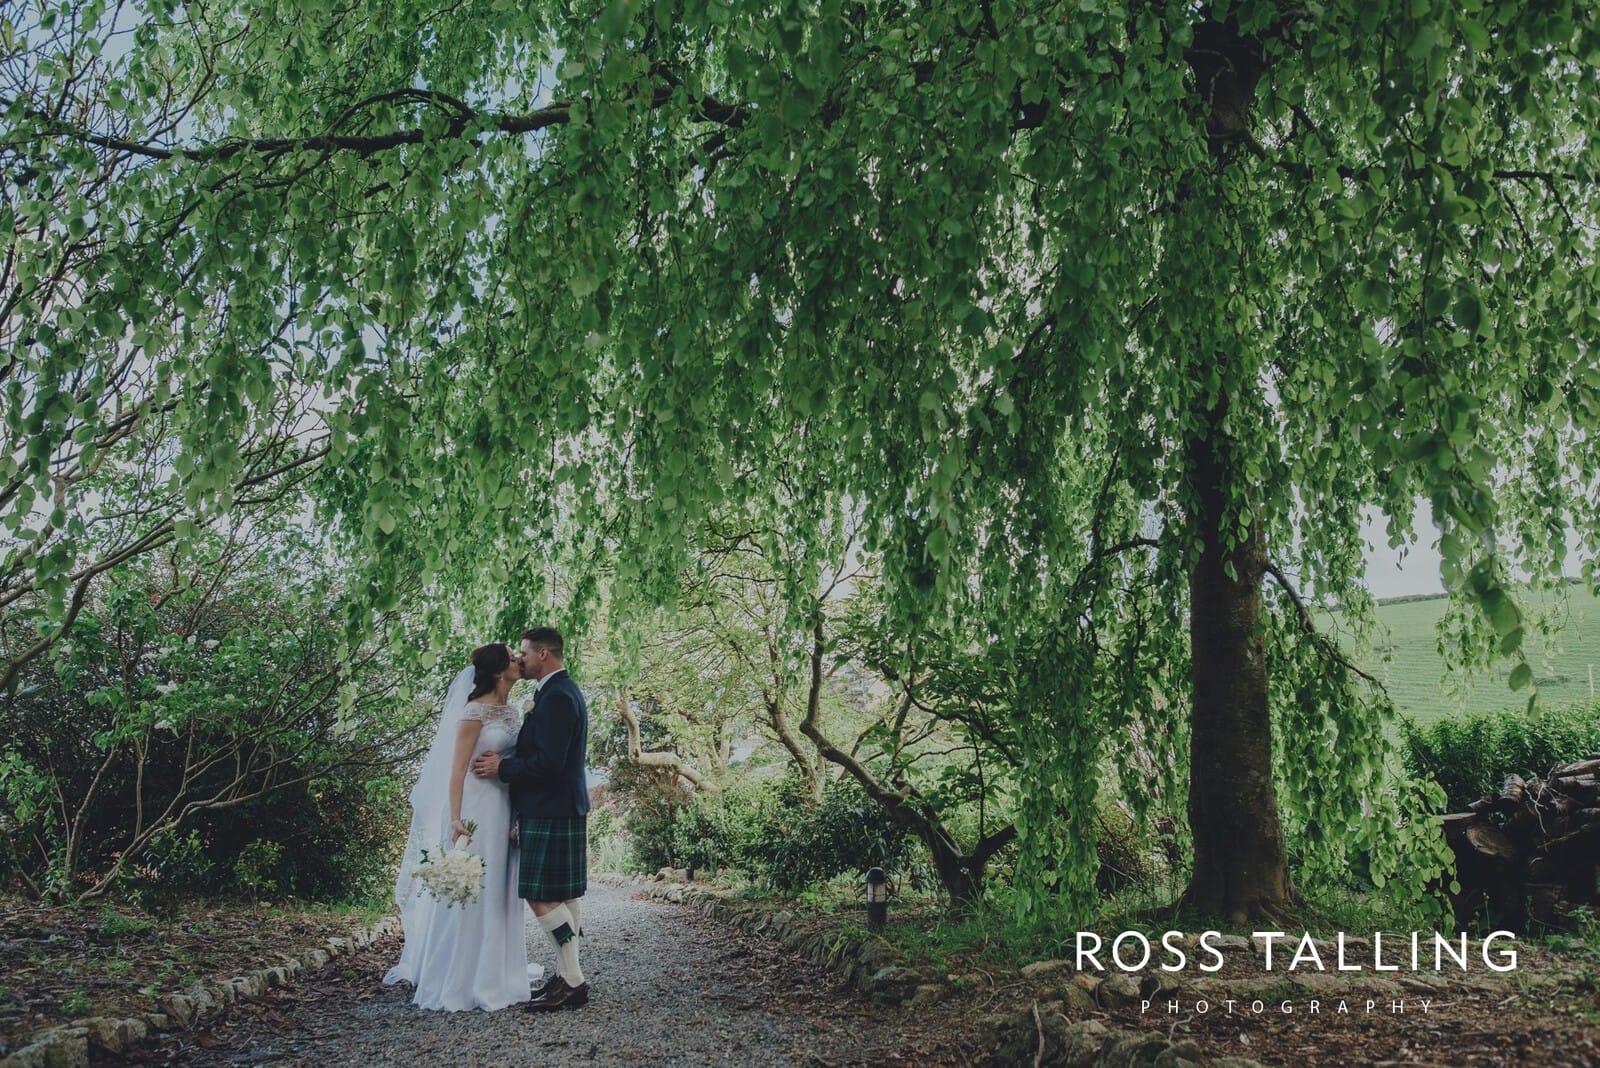 Polpier House Wedding Photography | Hew & Donna